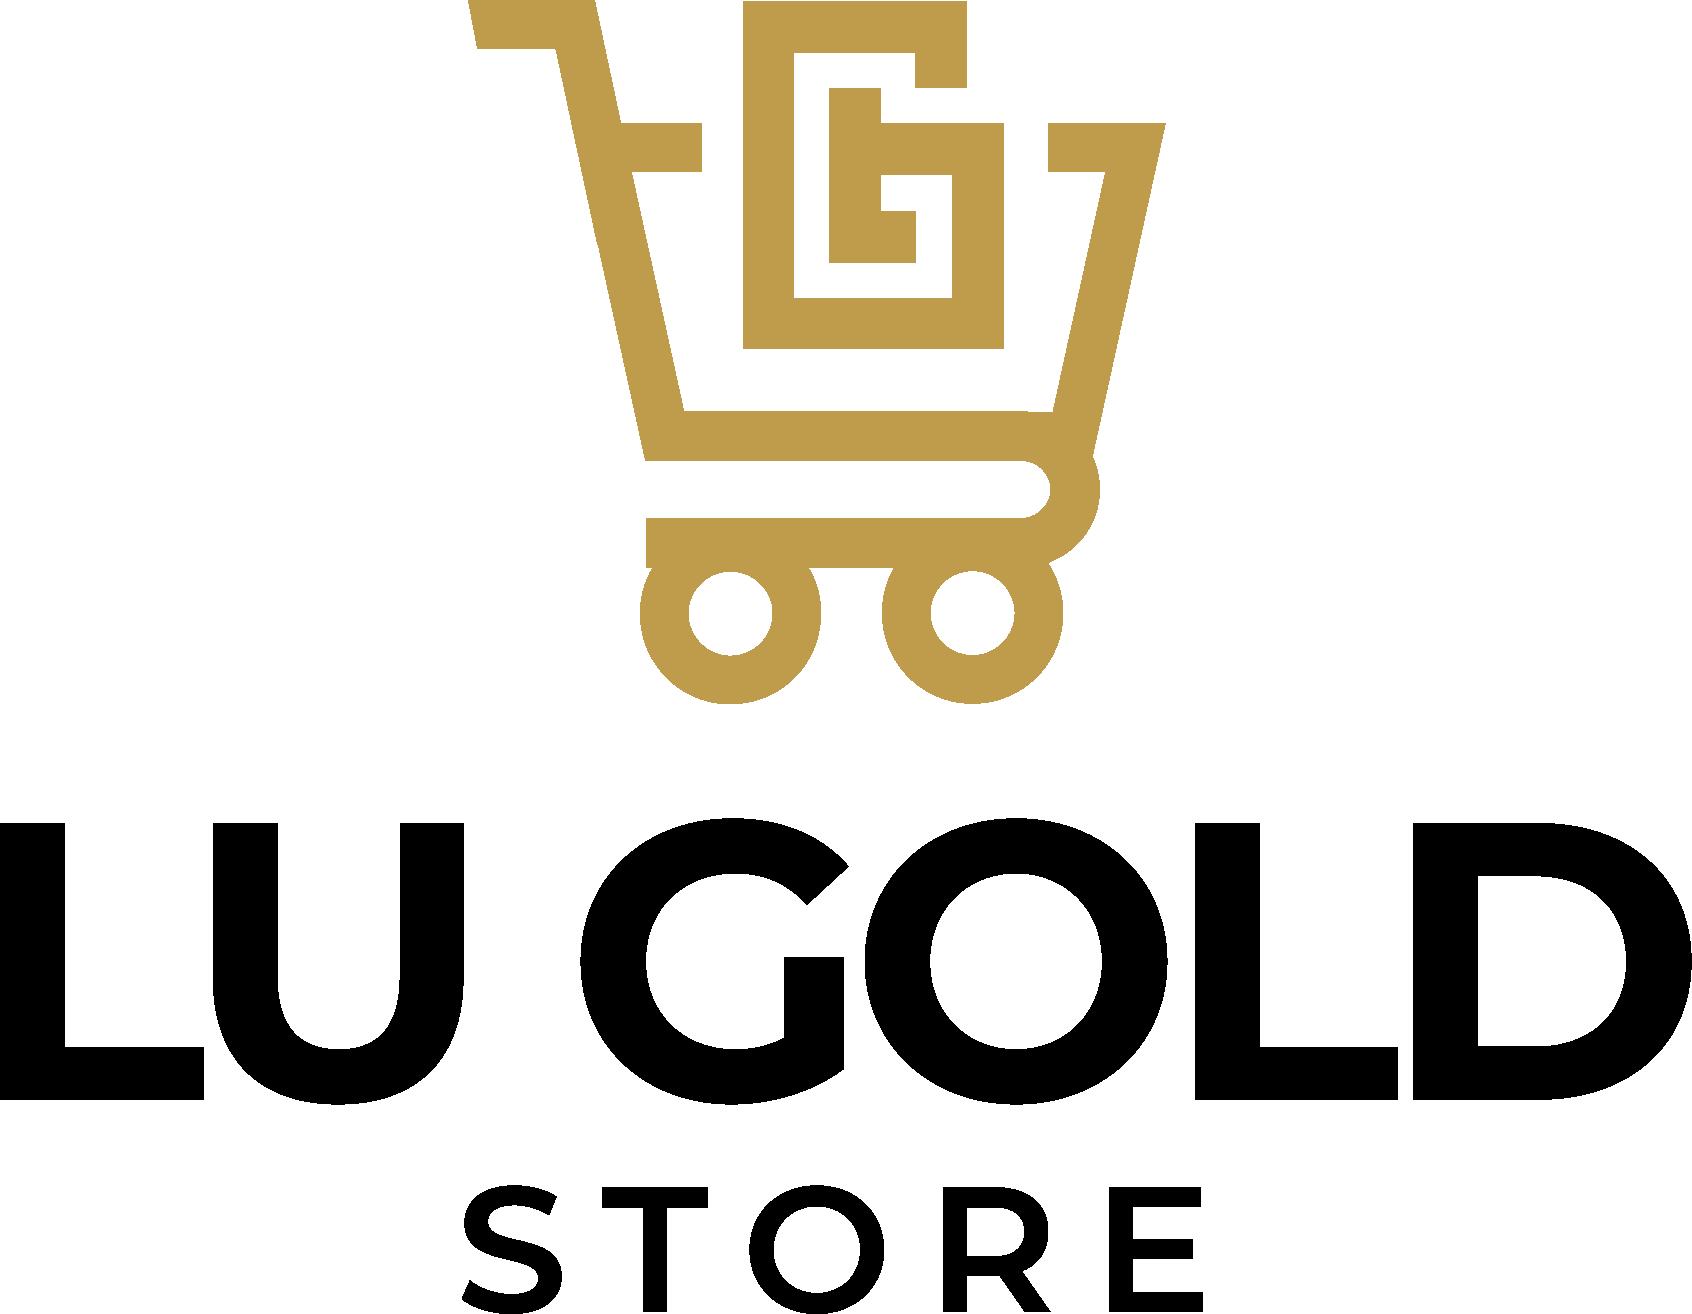 Lu Gold Store Logo